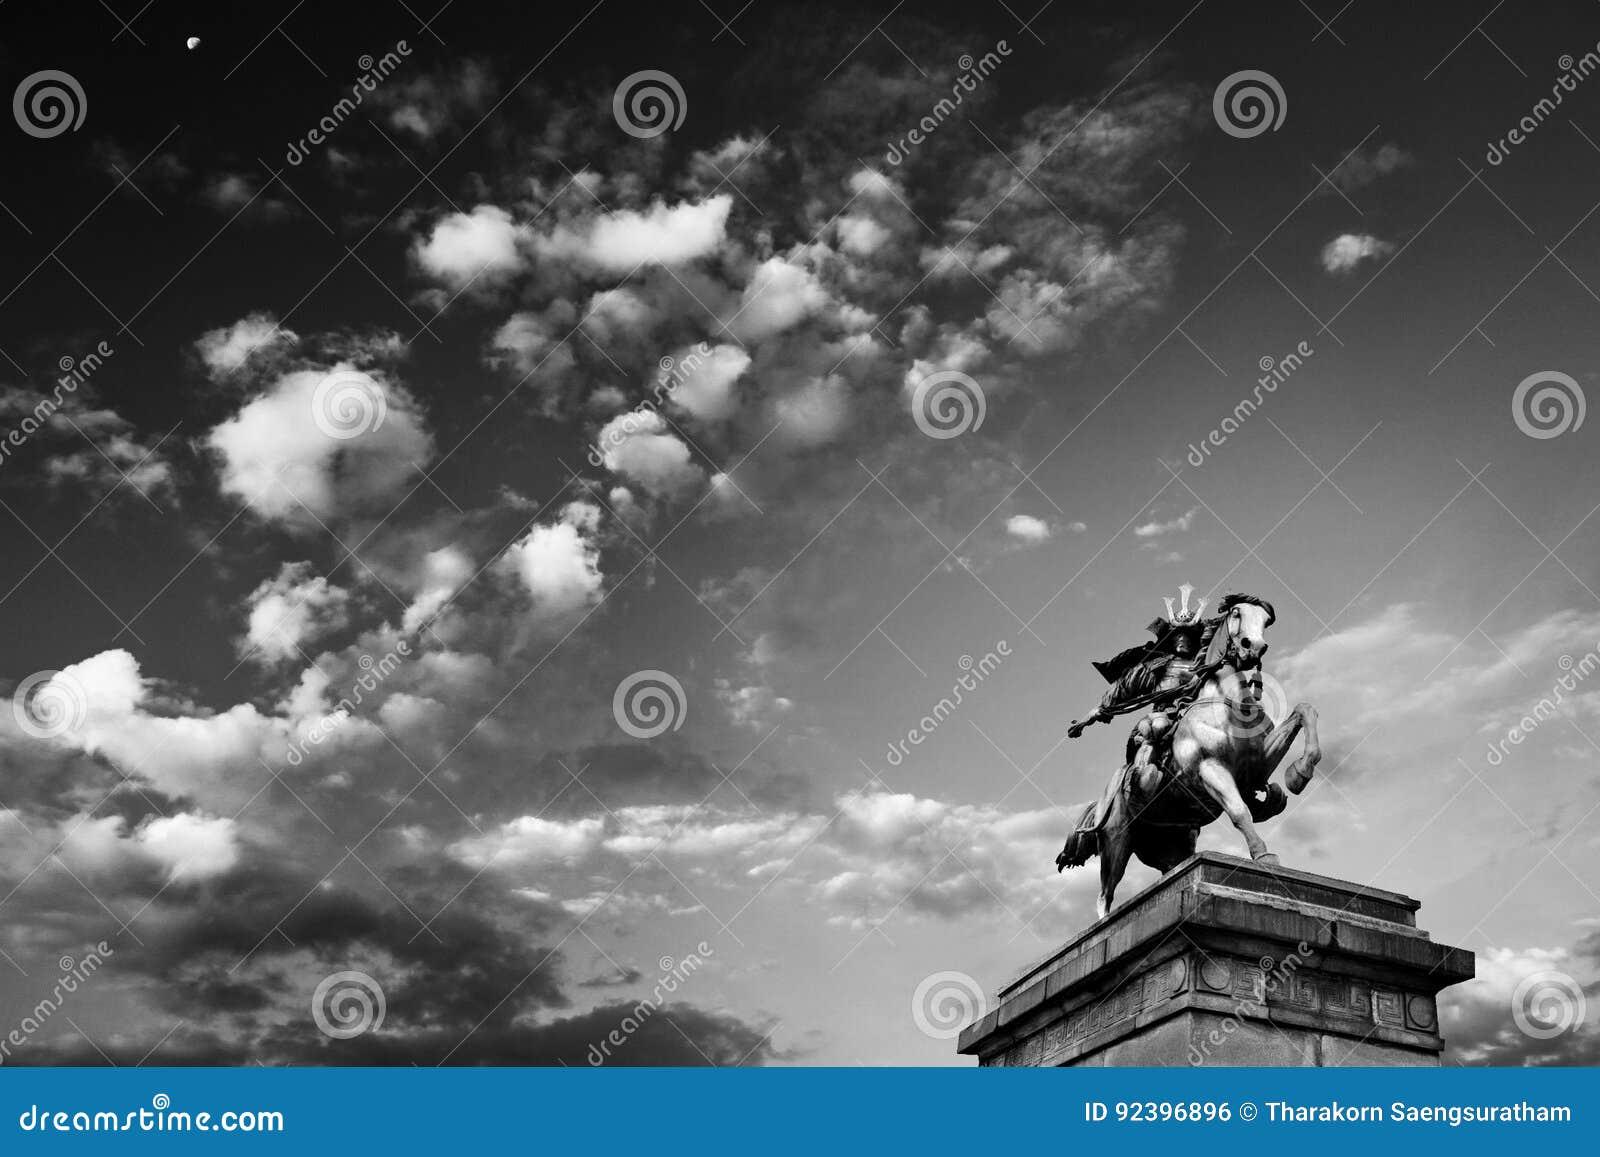 Bewolkt hemel en standbeeld van Kusunoki Masashige, Keizerpaleis binnen